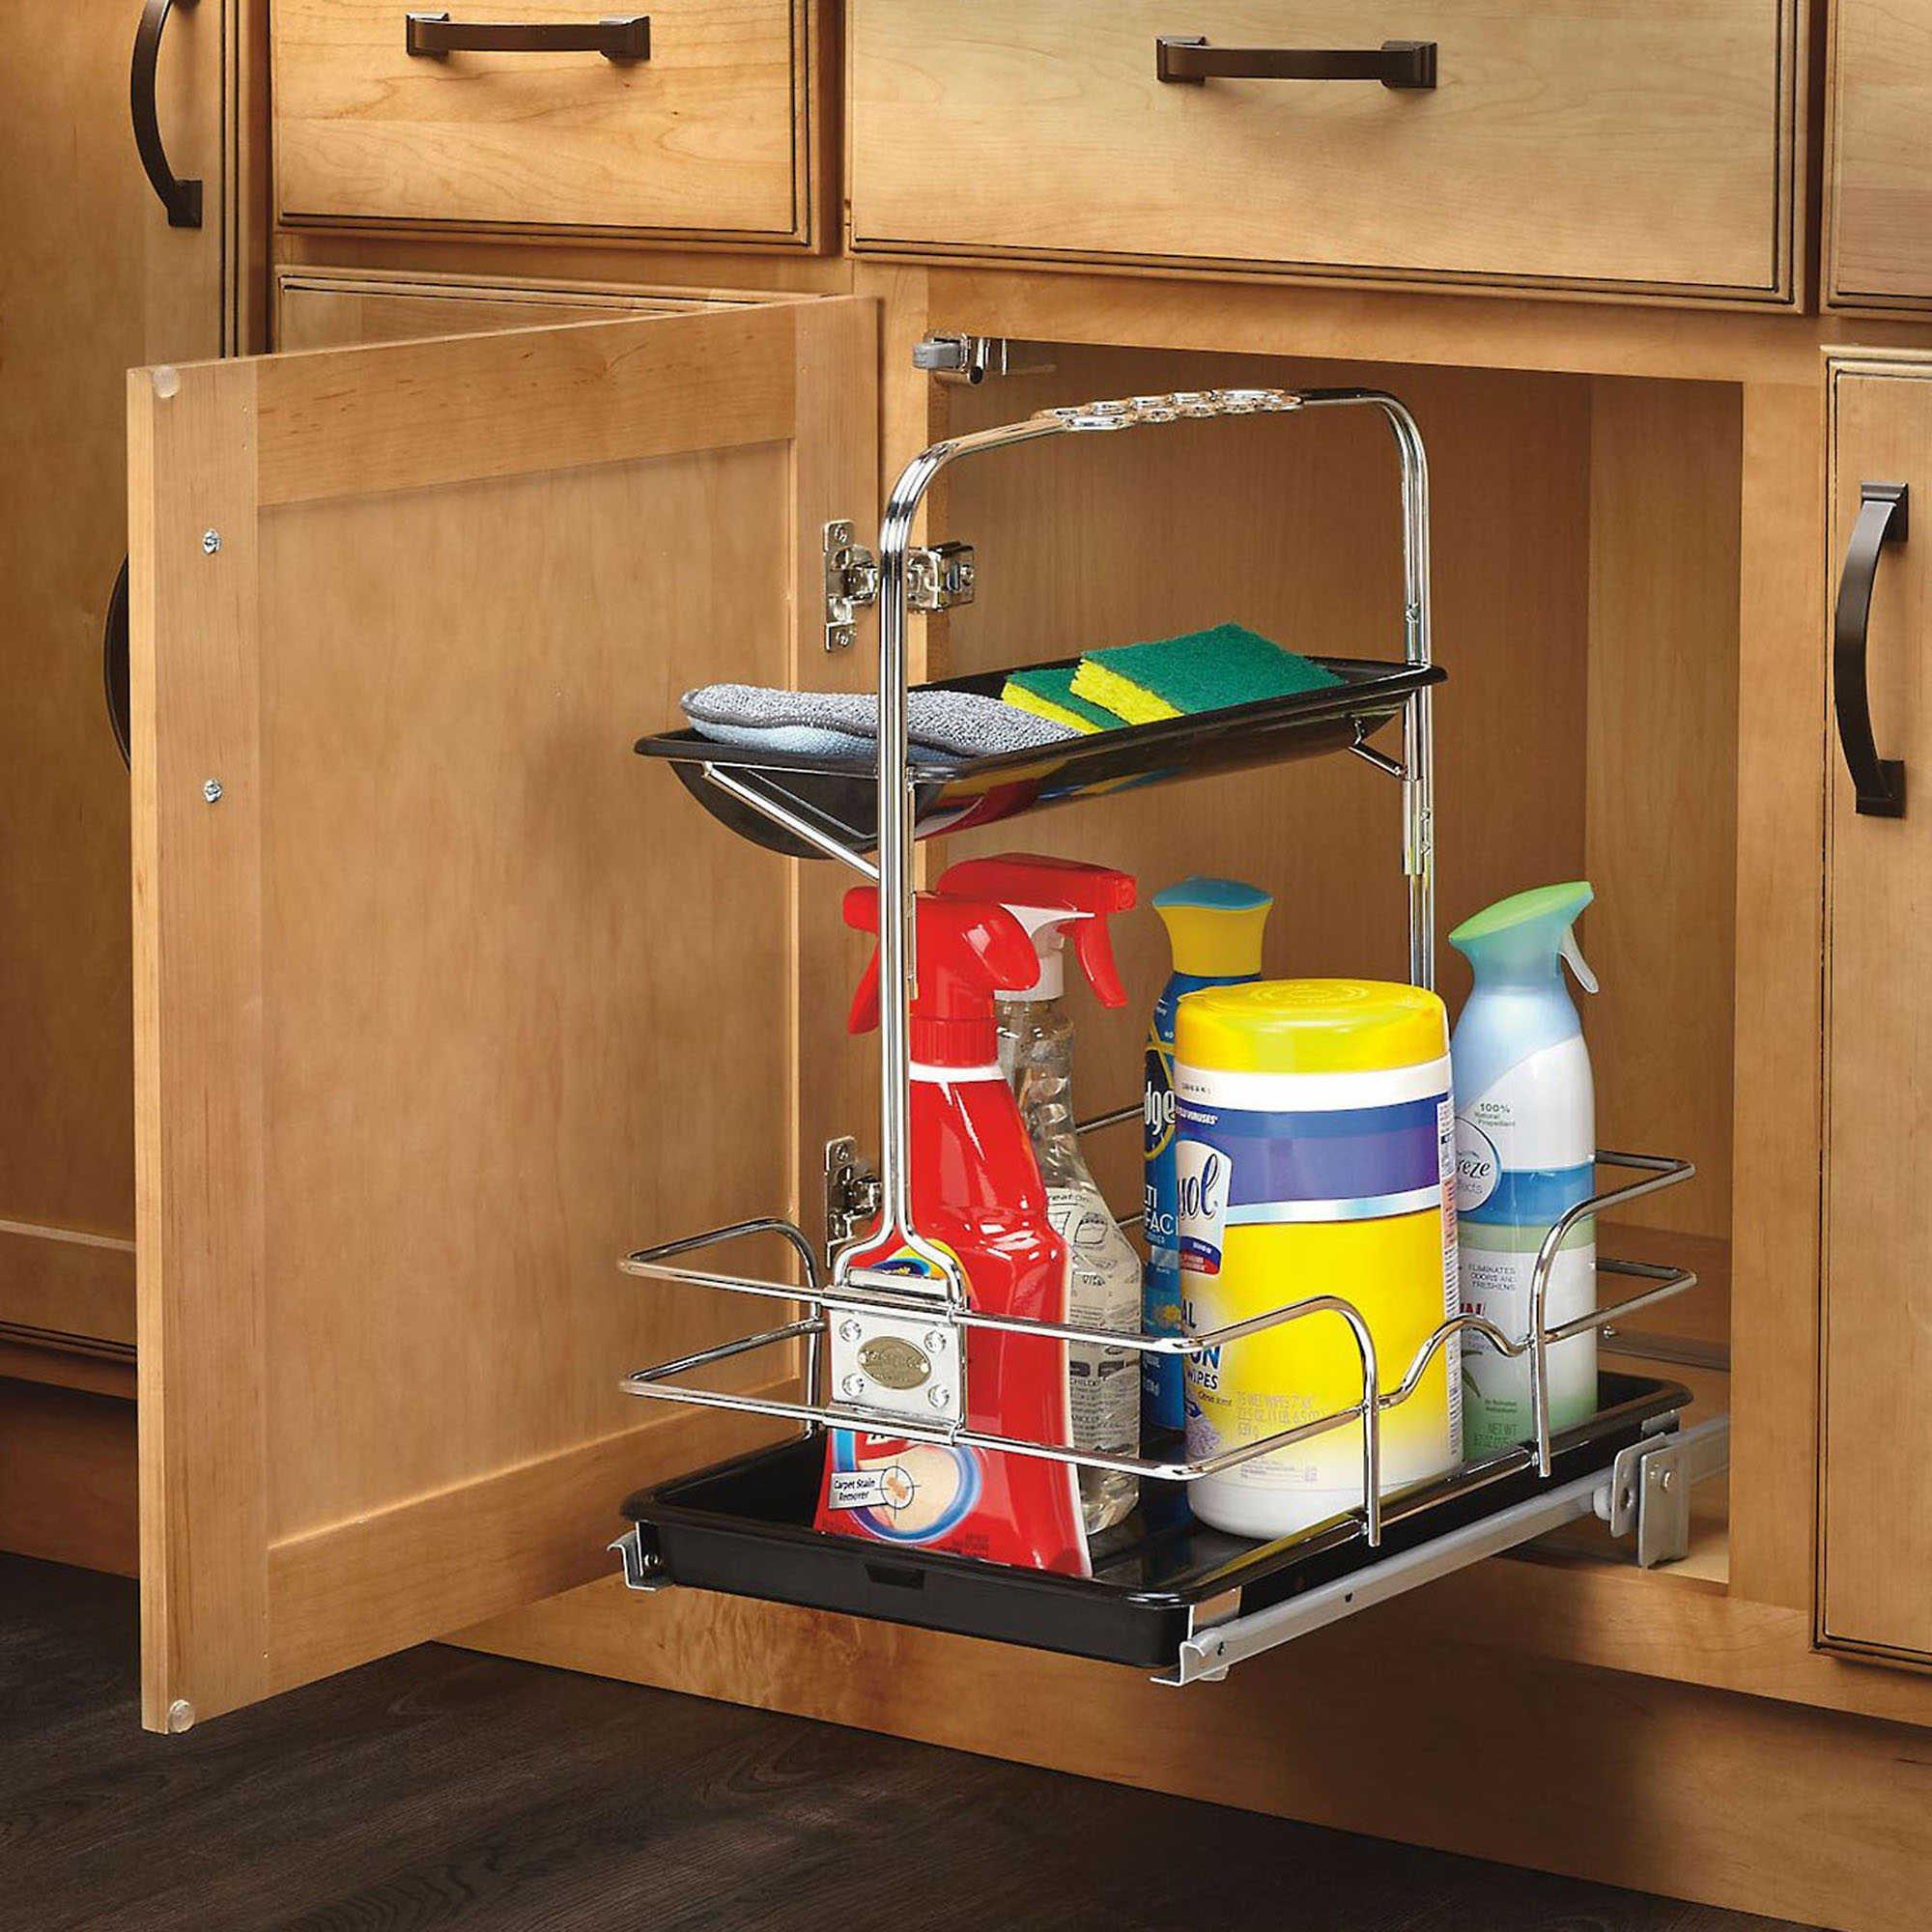 Rev-A-Shelf - 544-10C-1 - Under Sink Pull-Out Removable Chrome Caddy by Rev-A-Shelf